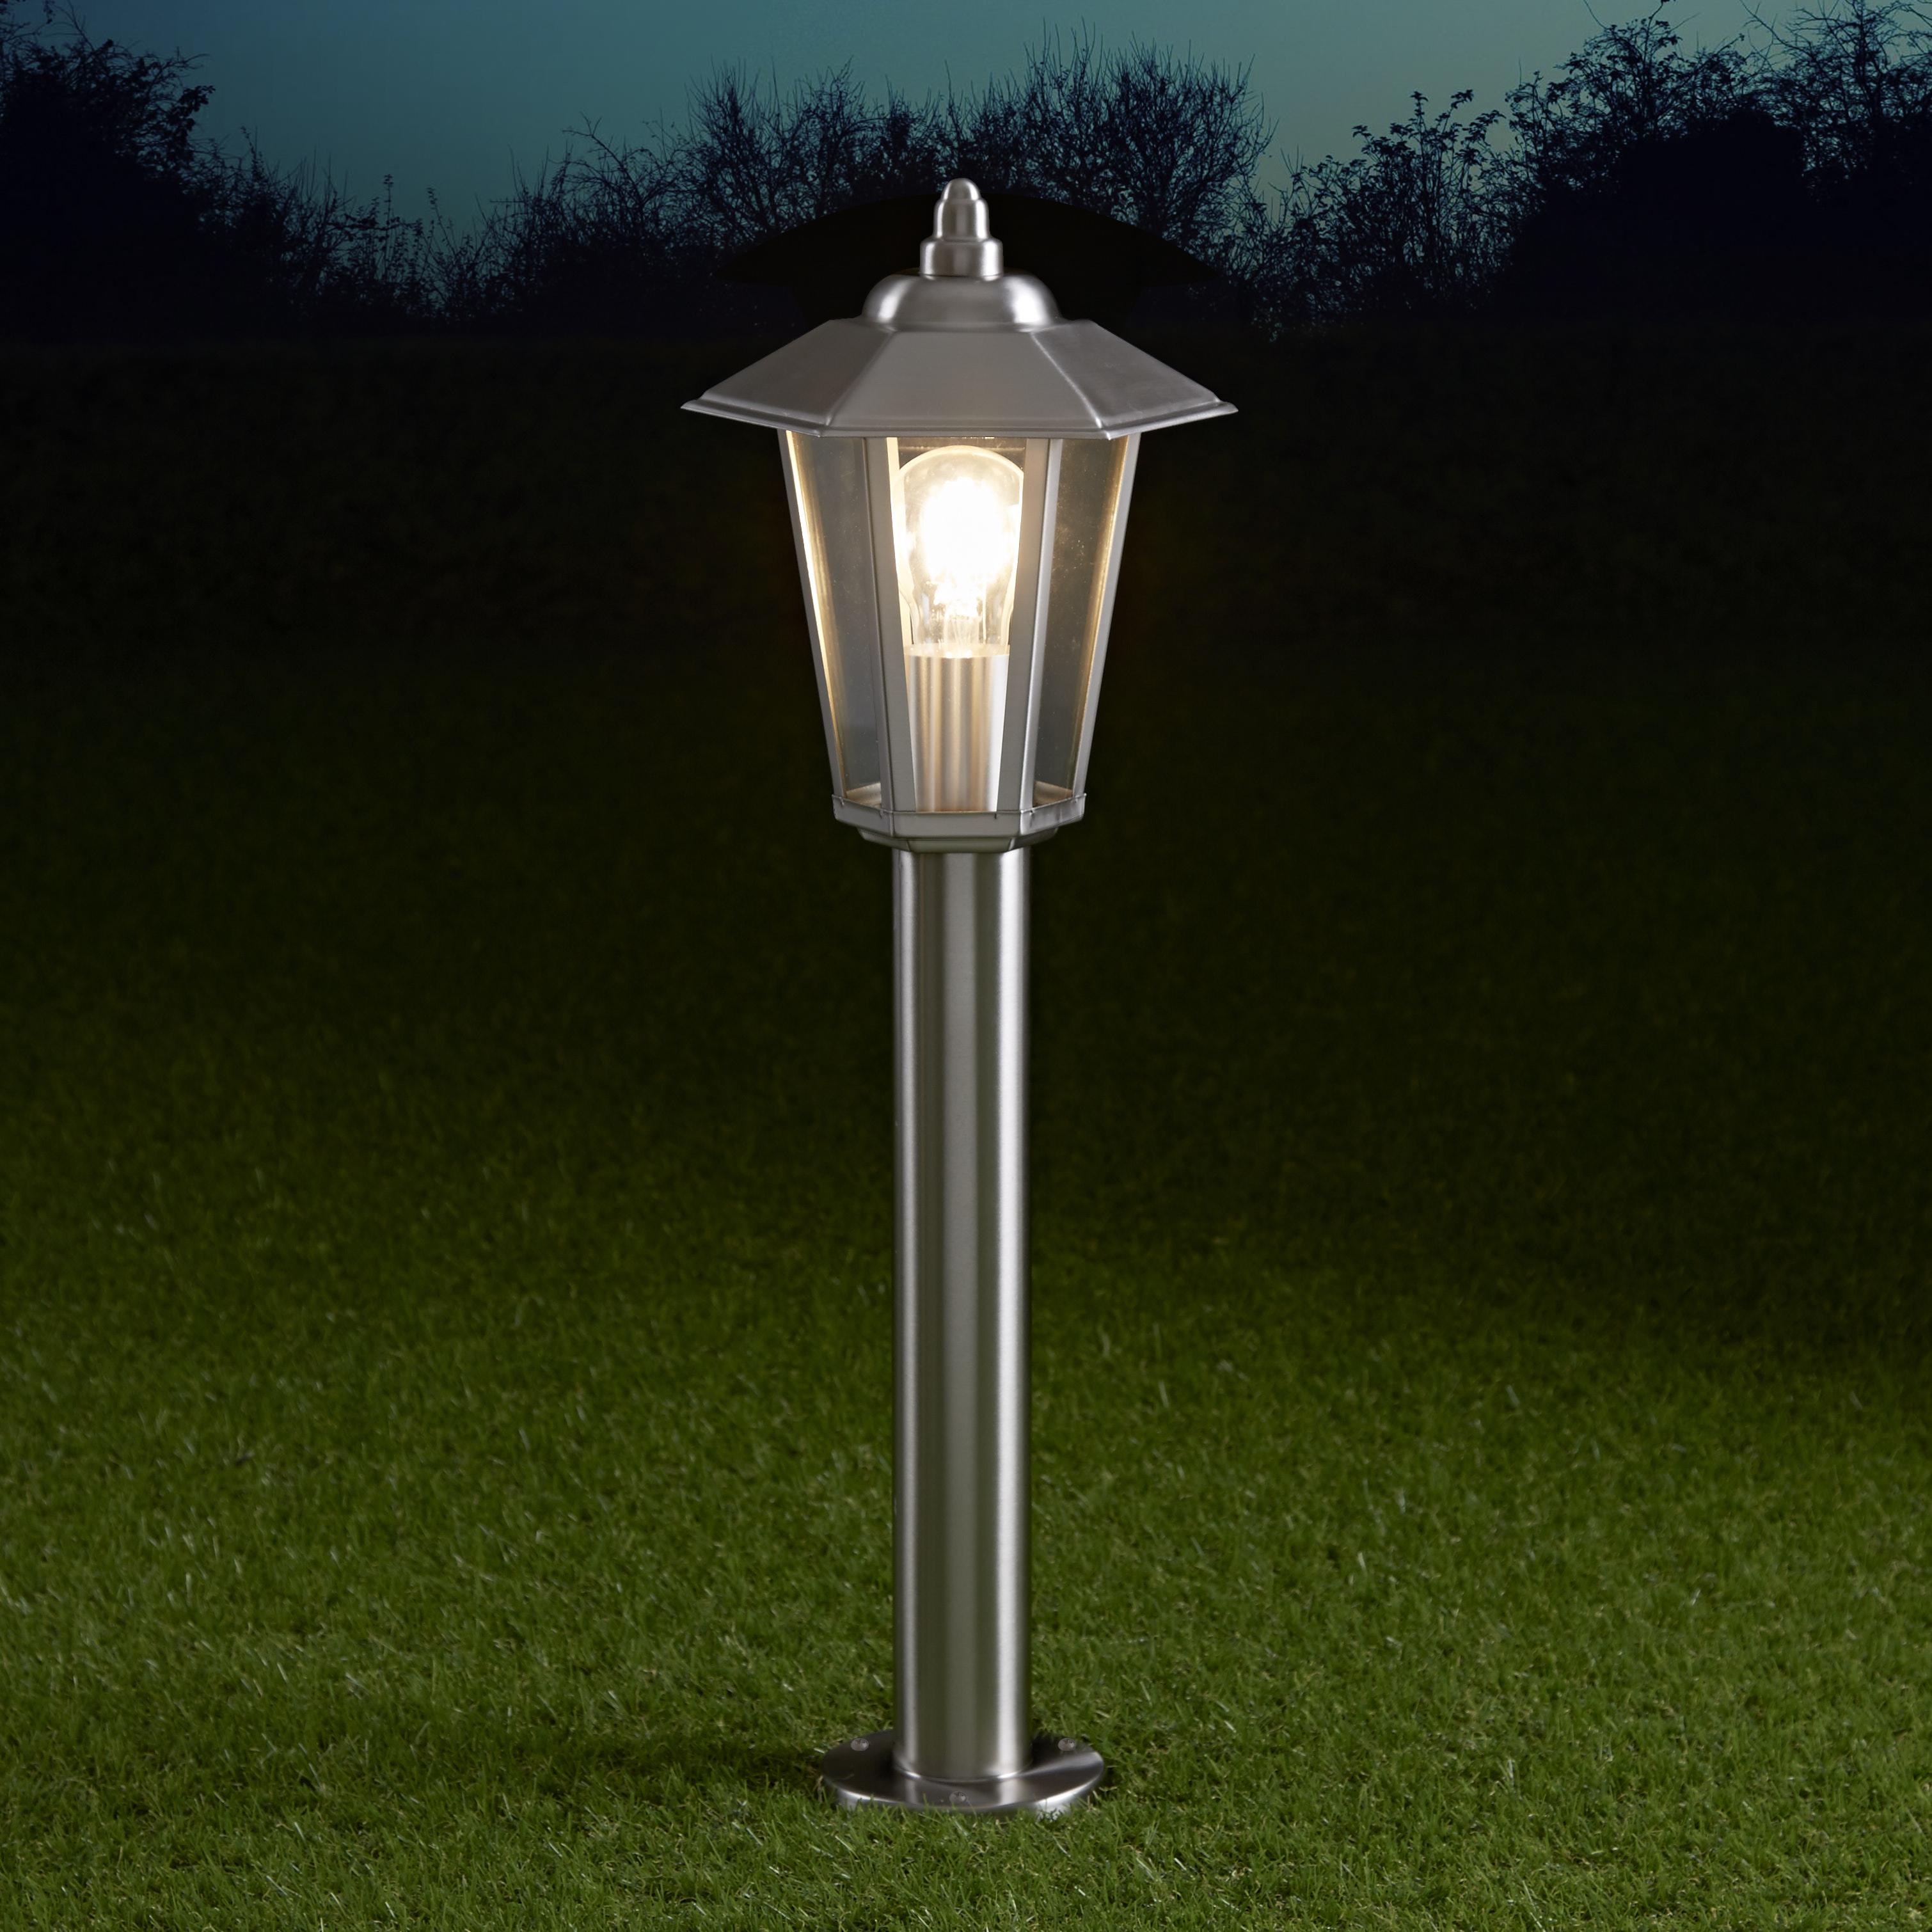 Biard Cannes Dimbare Sokkellamp 60cm RVS E27 IP44